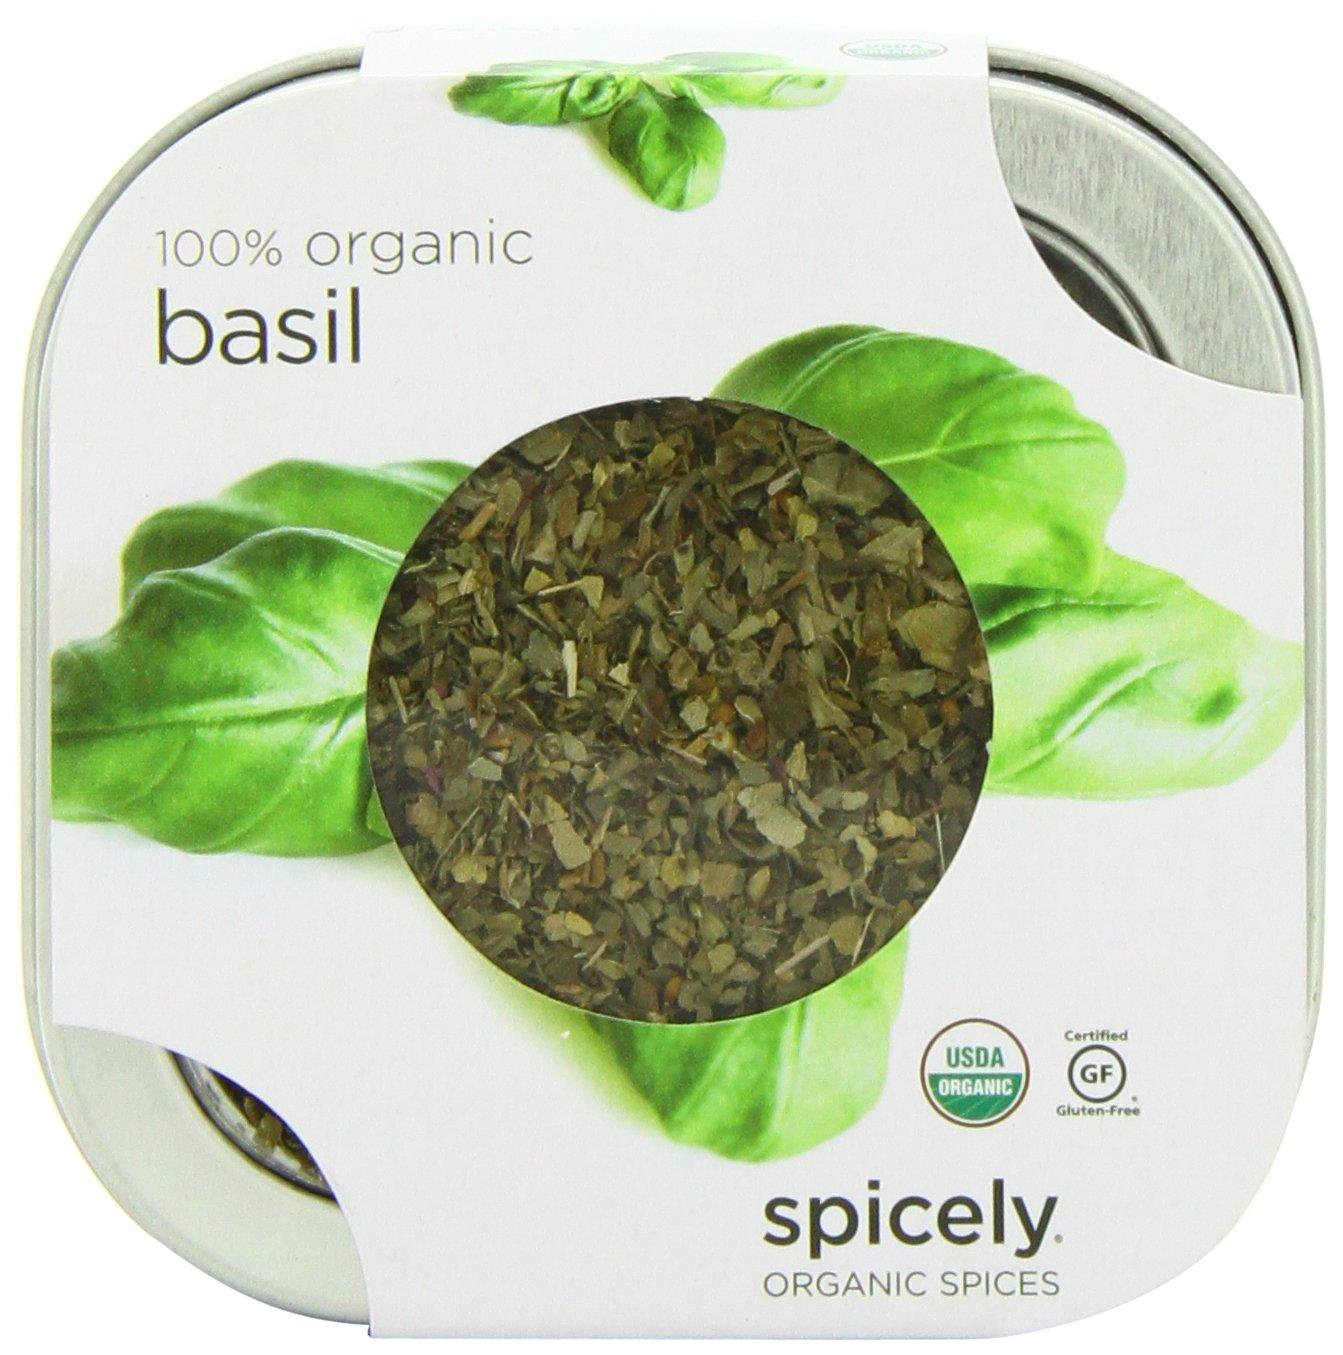 Spicely Organic Basil - Tin